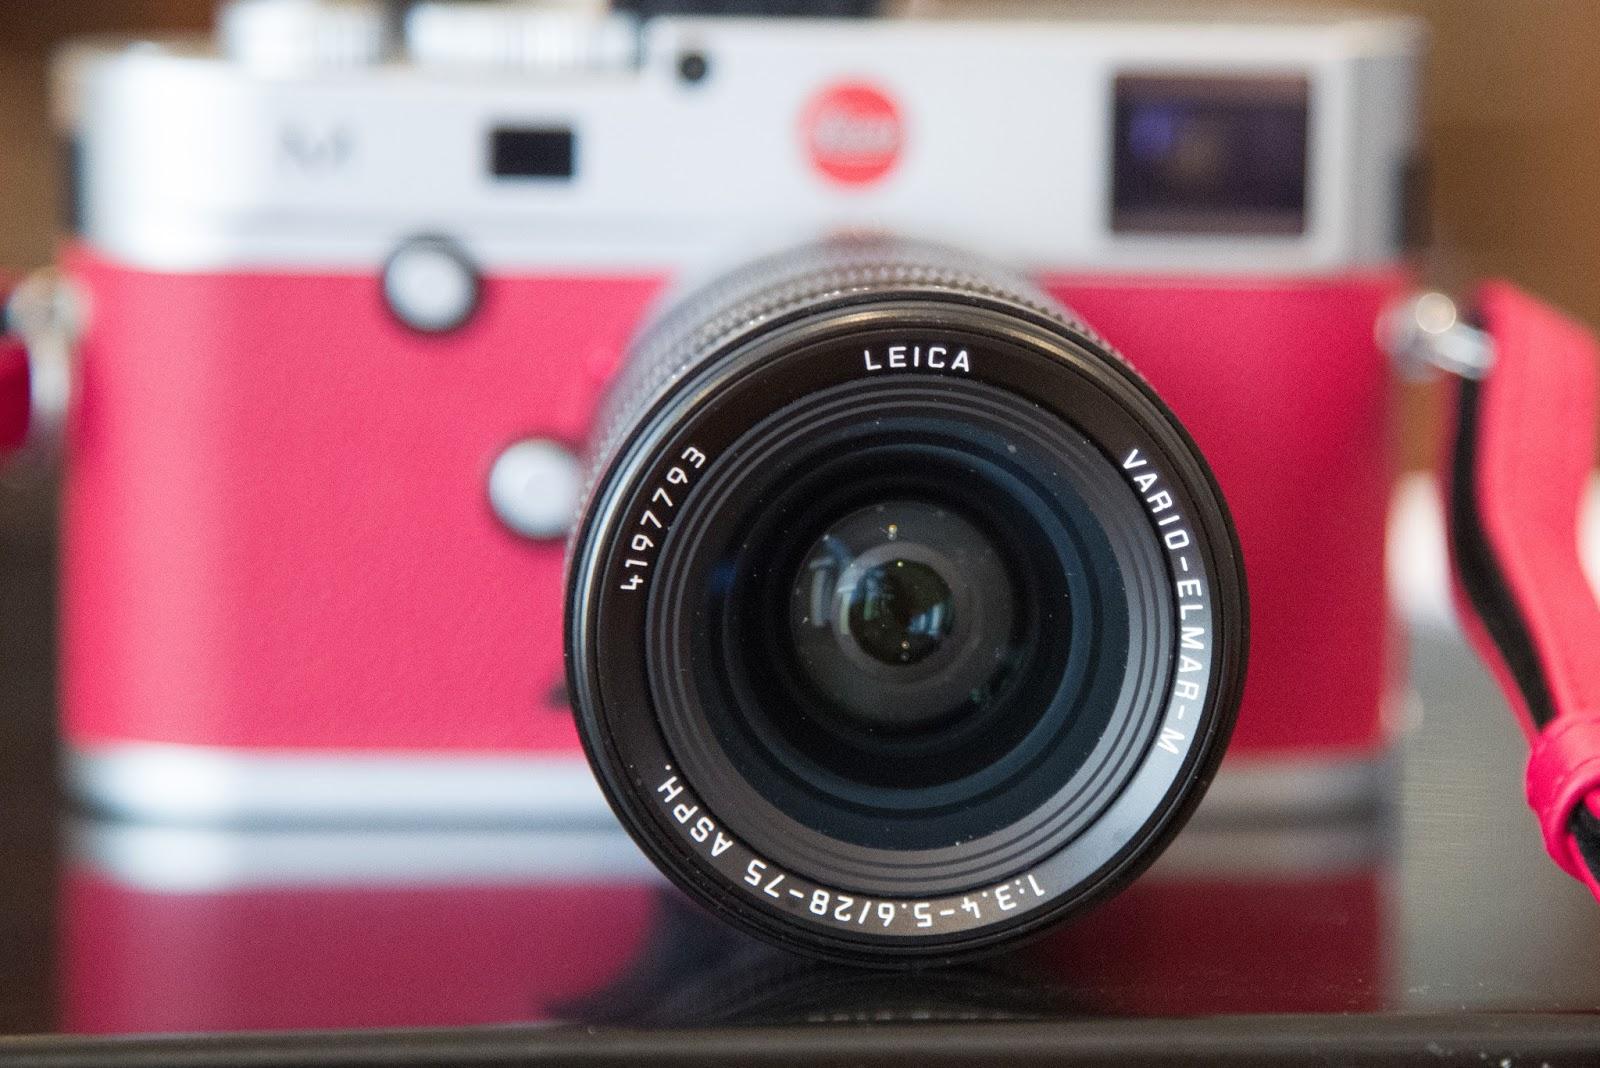 Leica Vario-Elmar-M 28-75mm f/3.4-5.6 Asph